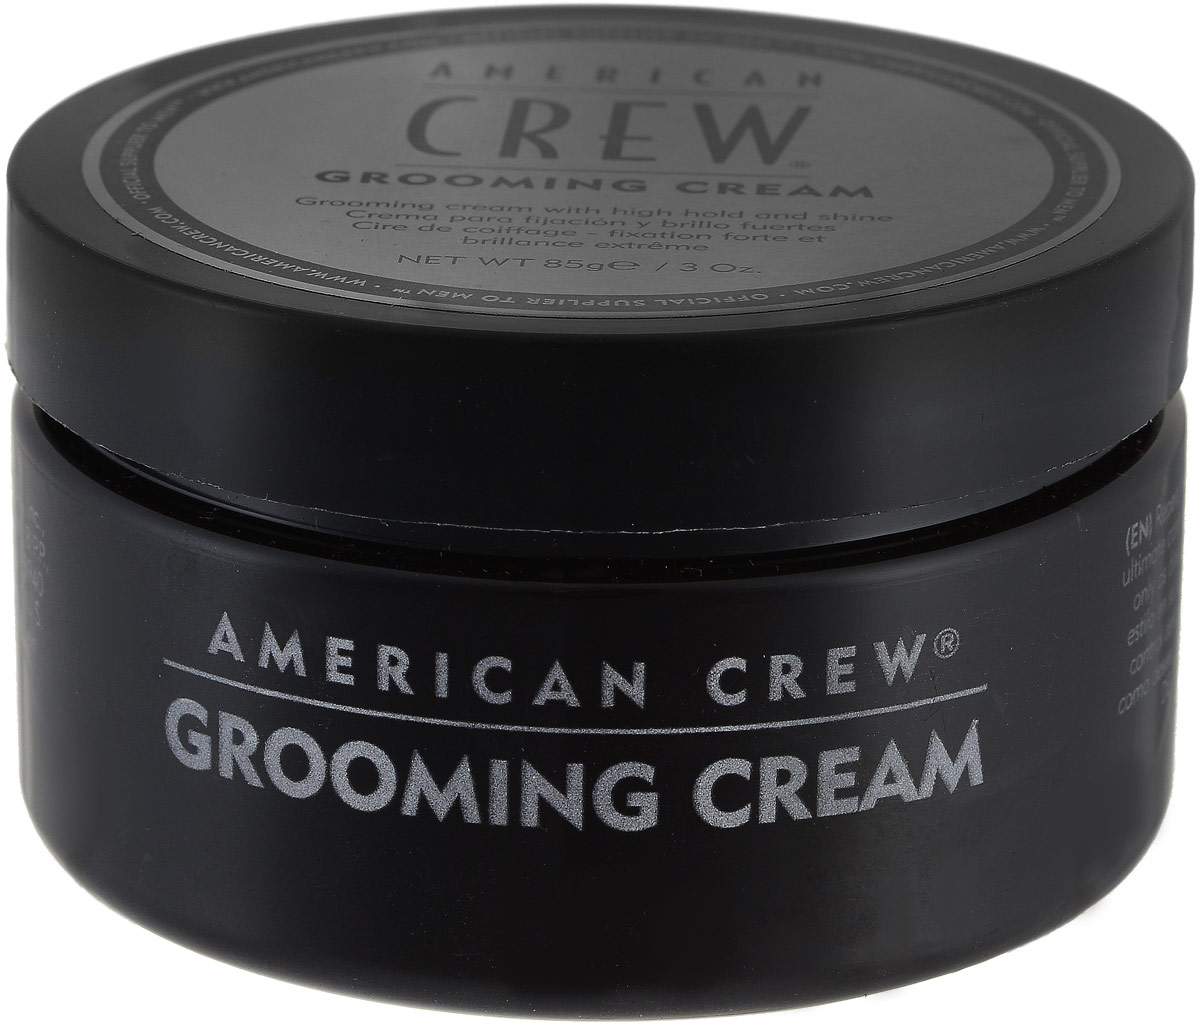 American Crew Крем для укладки волос Grooming Cream 85 мл